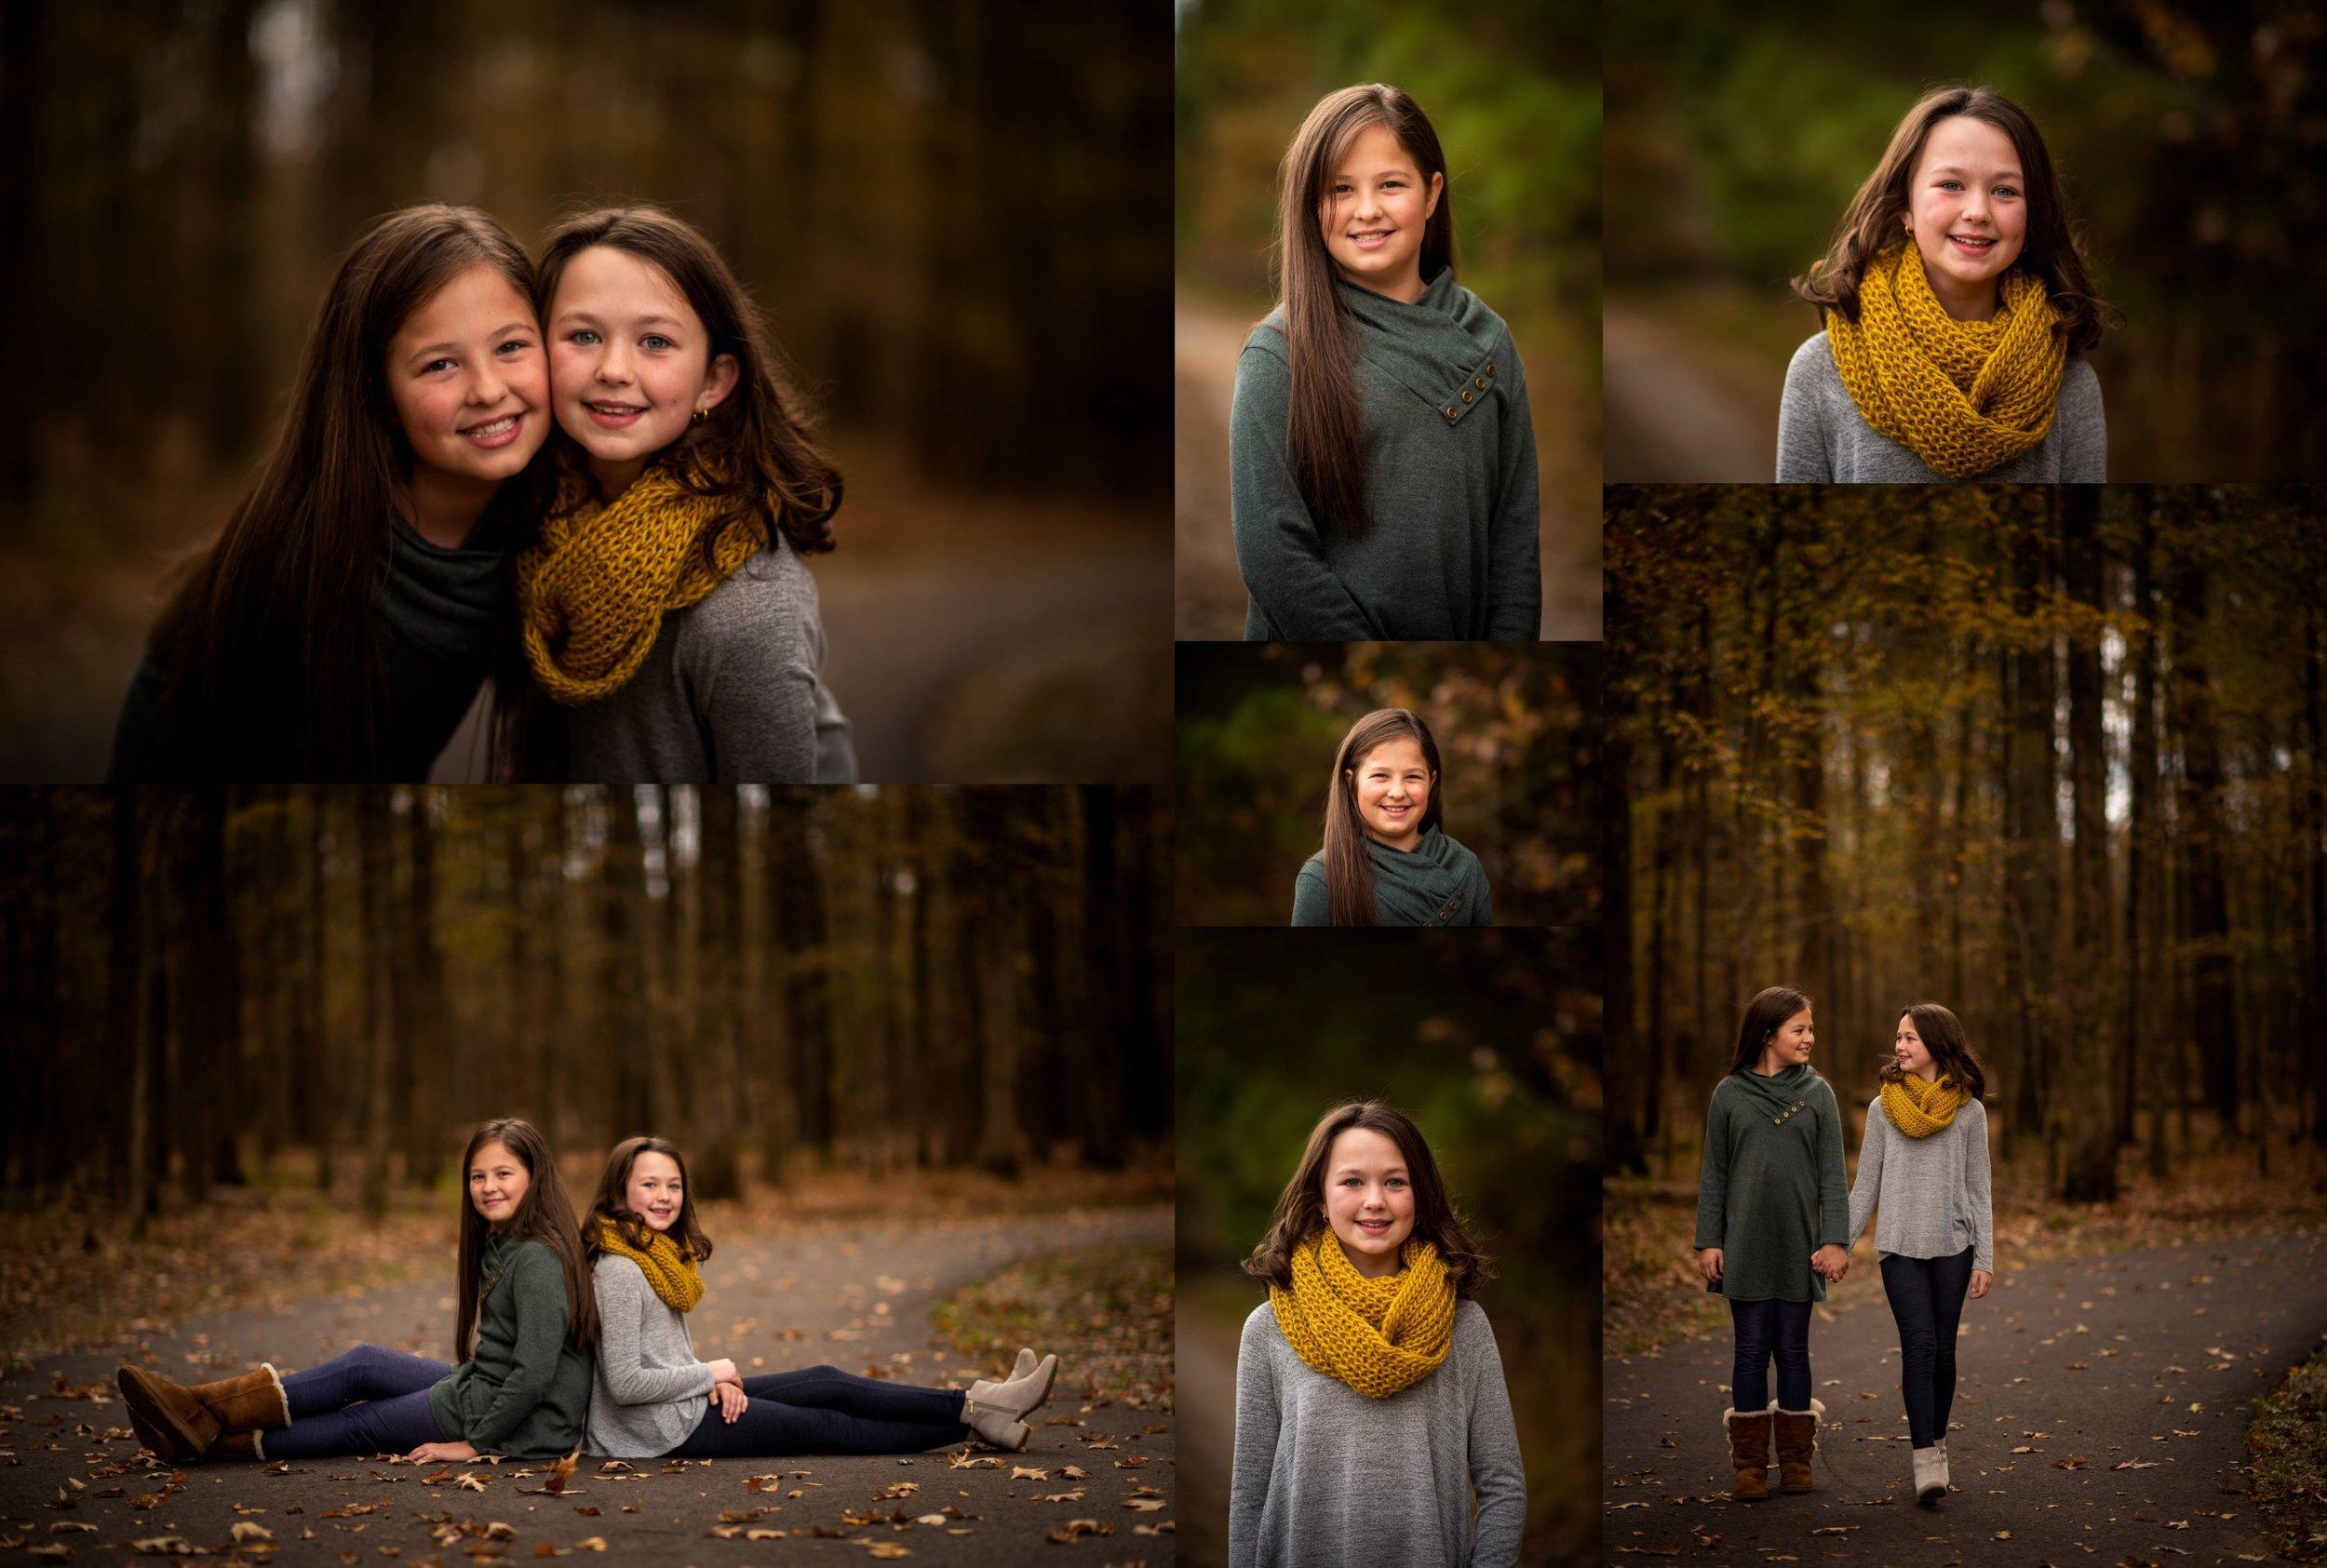 Collierville Photographer